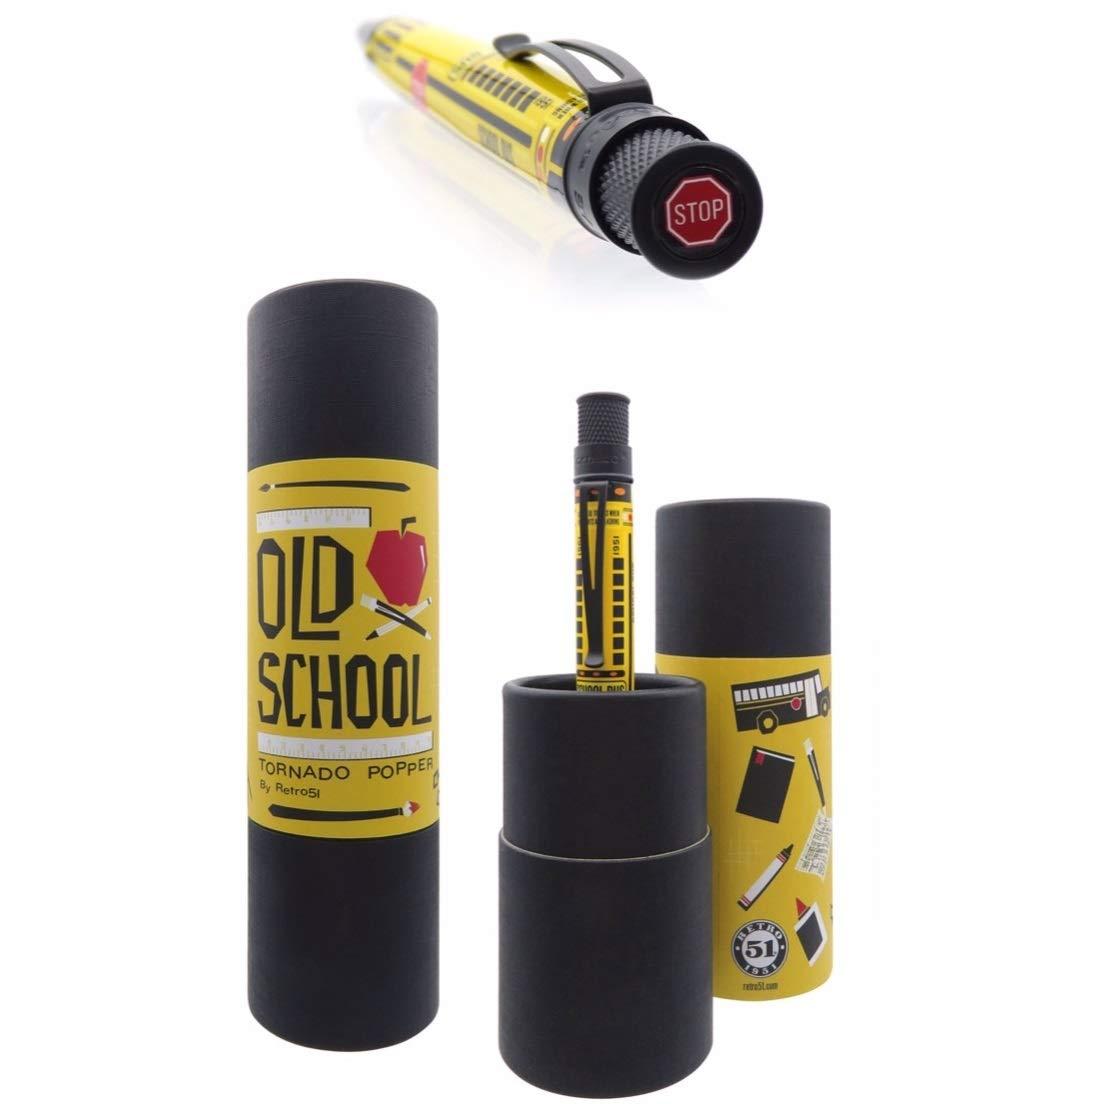 Retro 51 Tornado Popper Rollerball Pen Old School